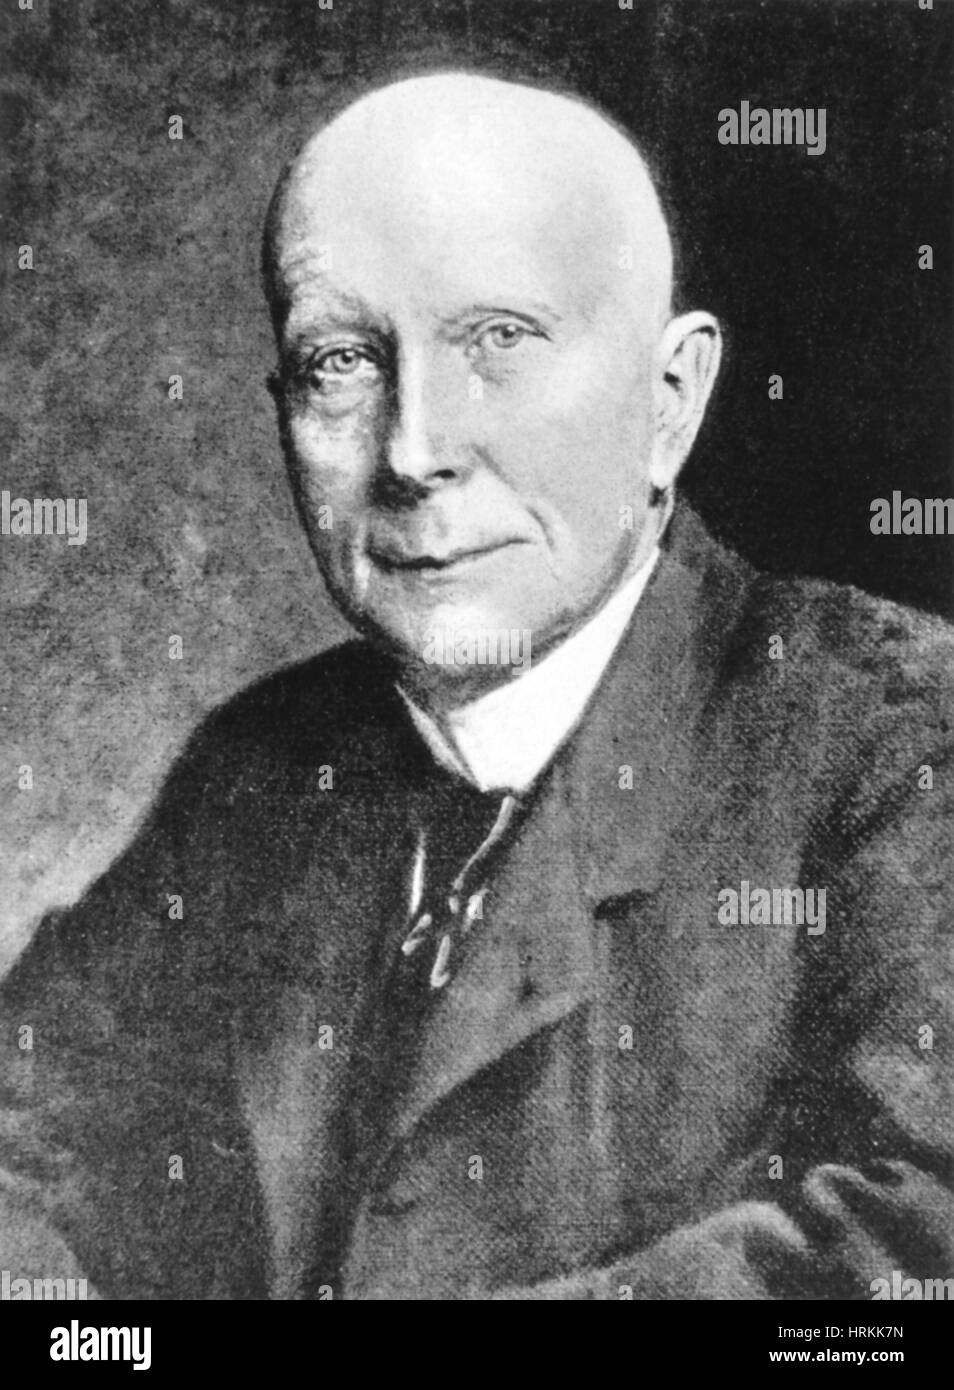 John D. Rockefeller, American Industrialist - Stock Image